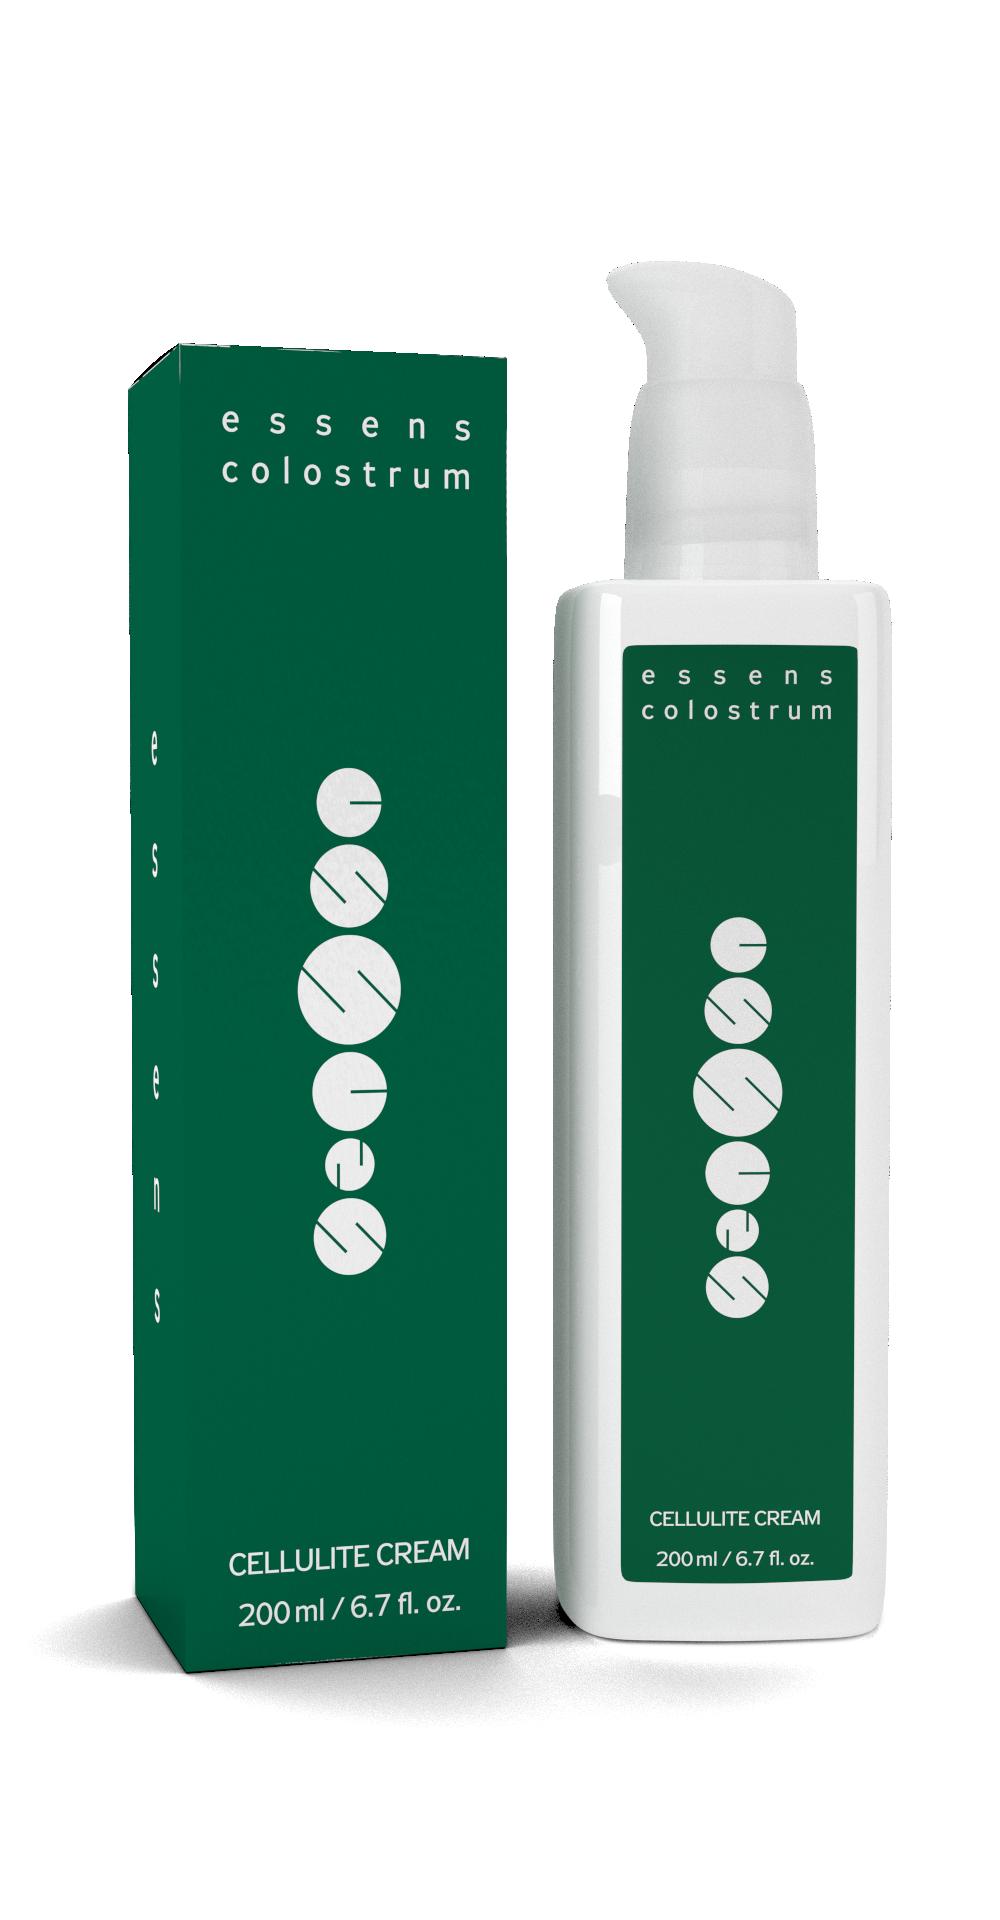 Crème anti-cellulite au colostrum